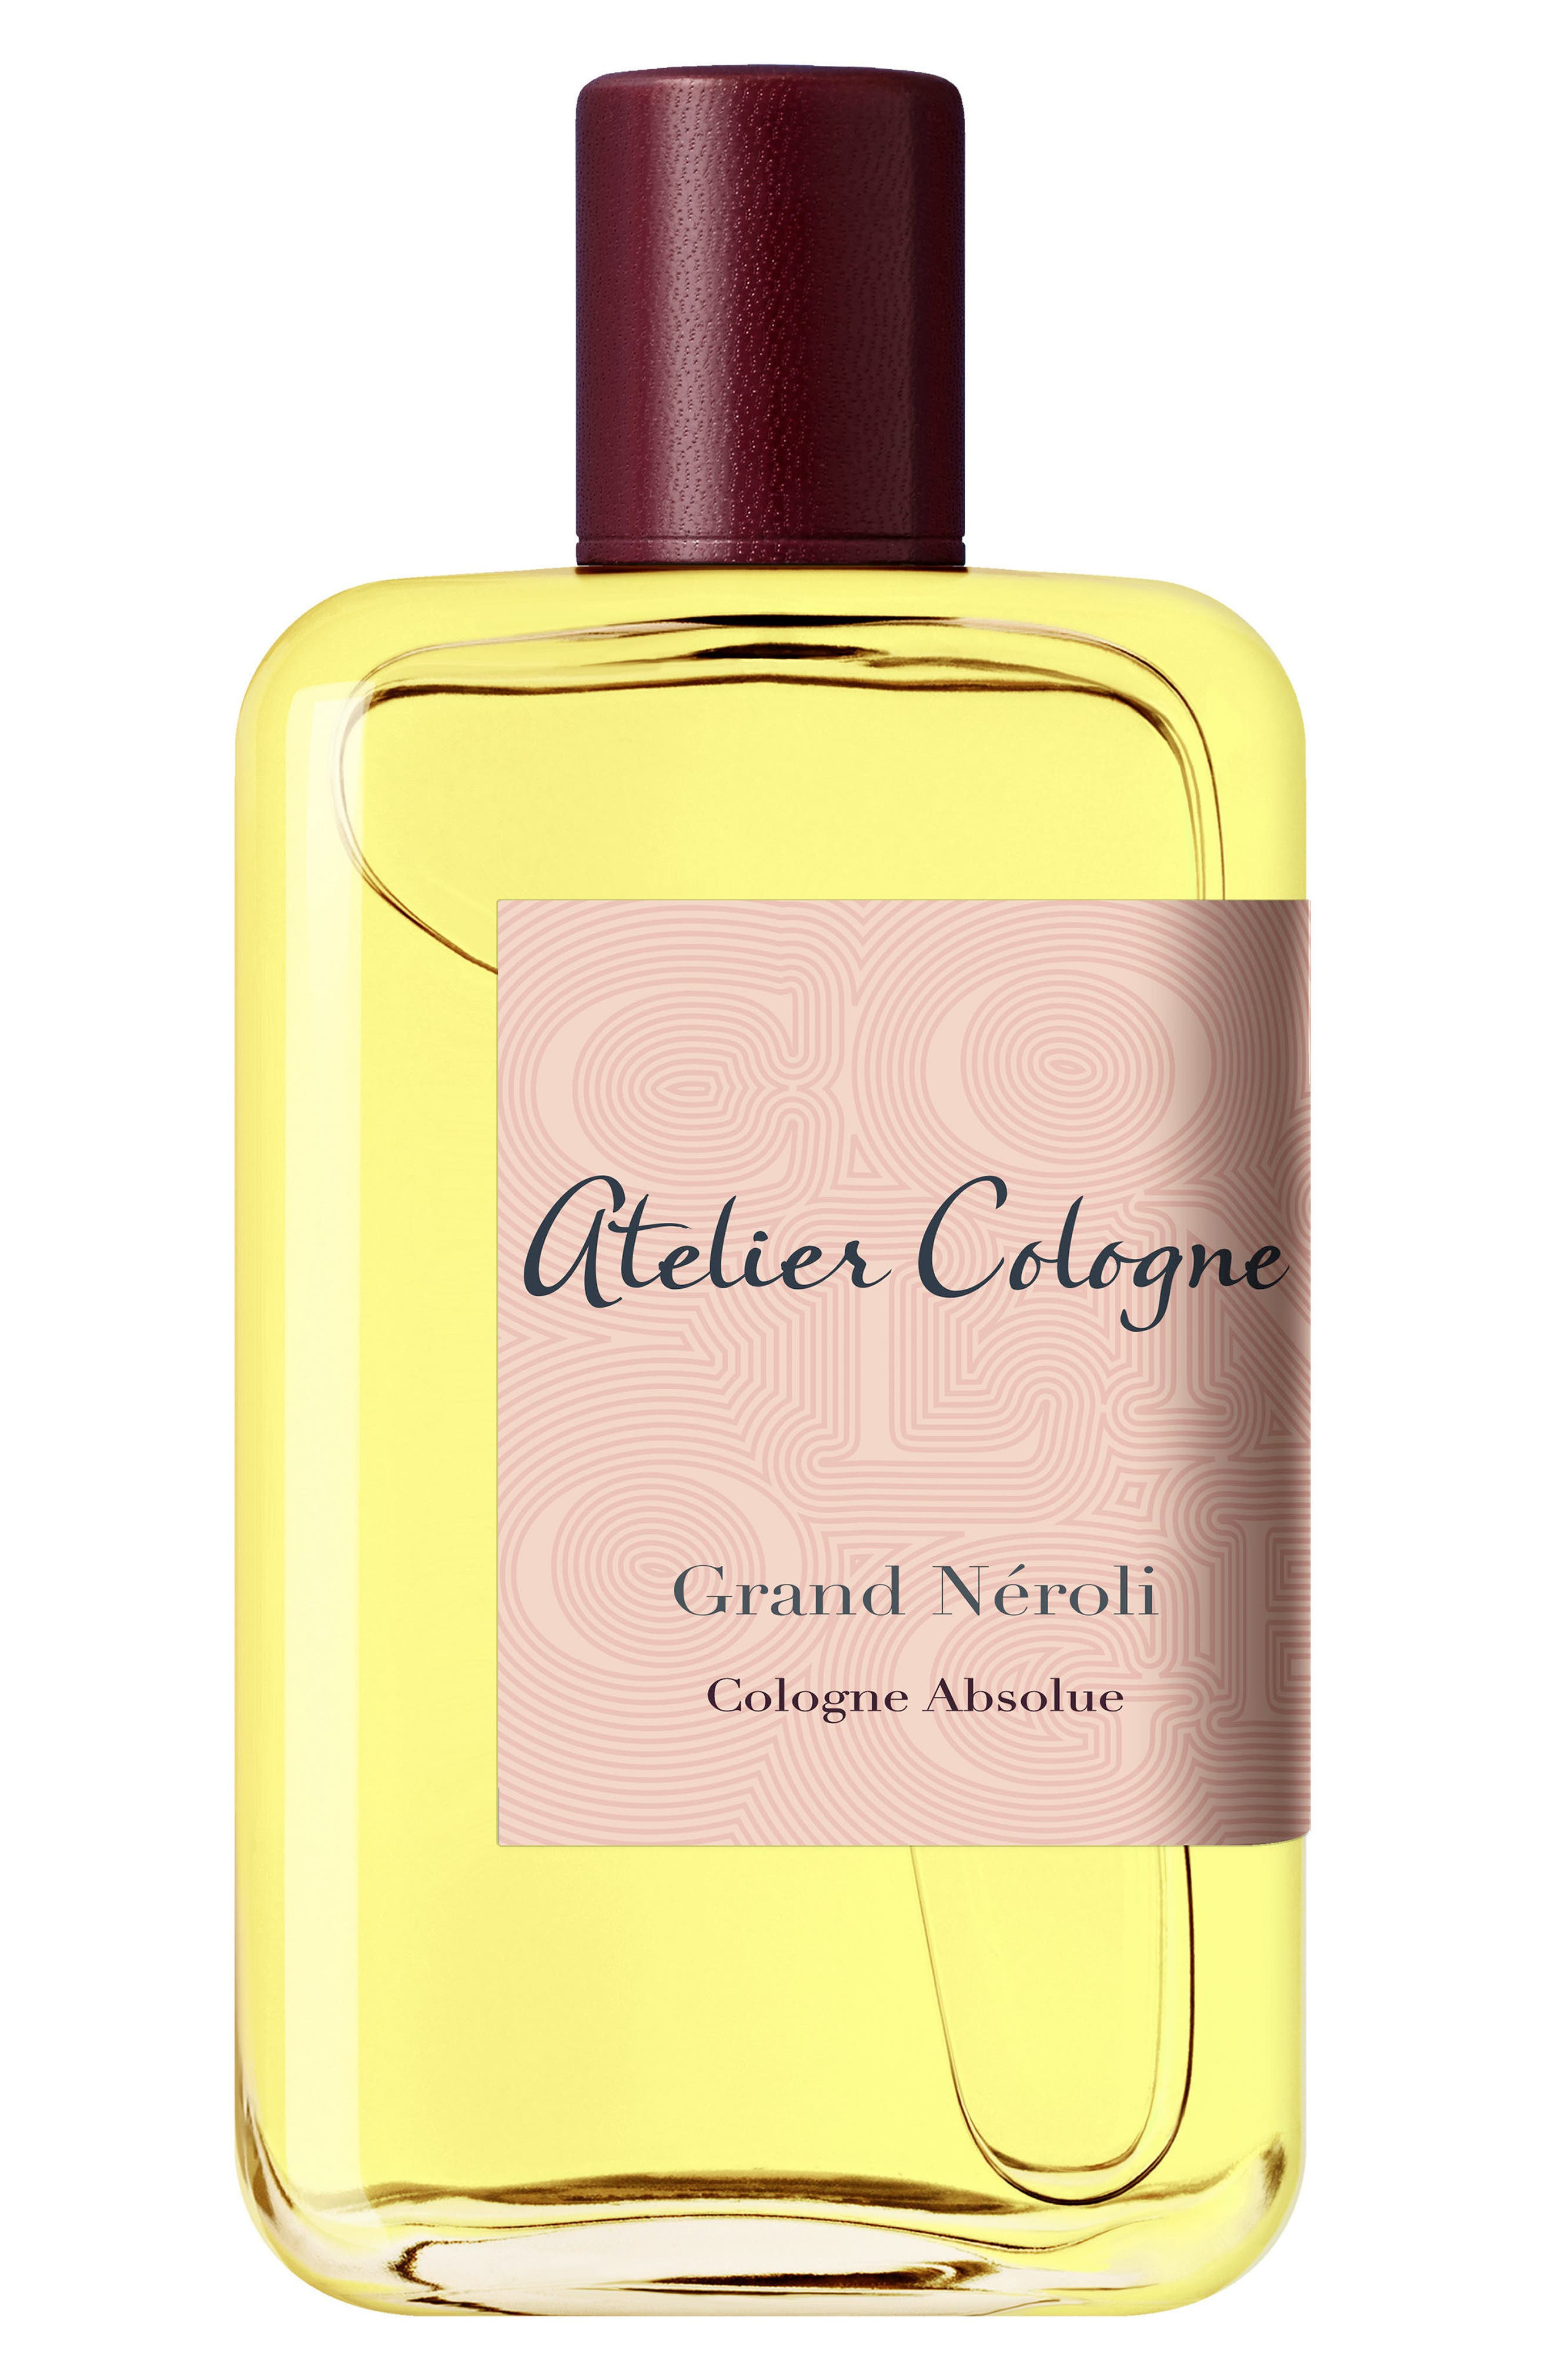 Grand Neroli Cologne Absolue